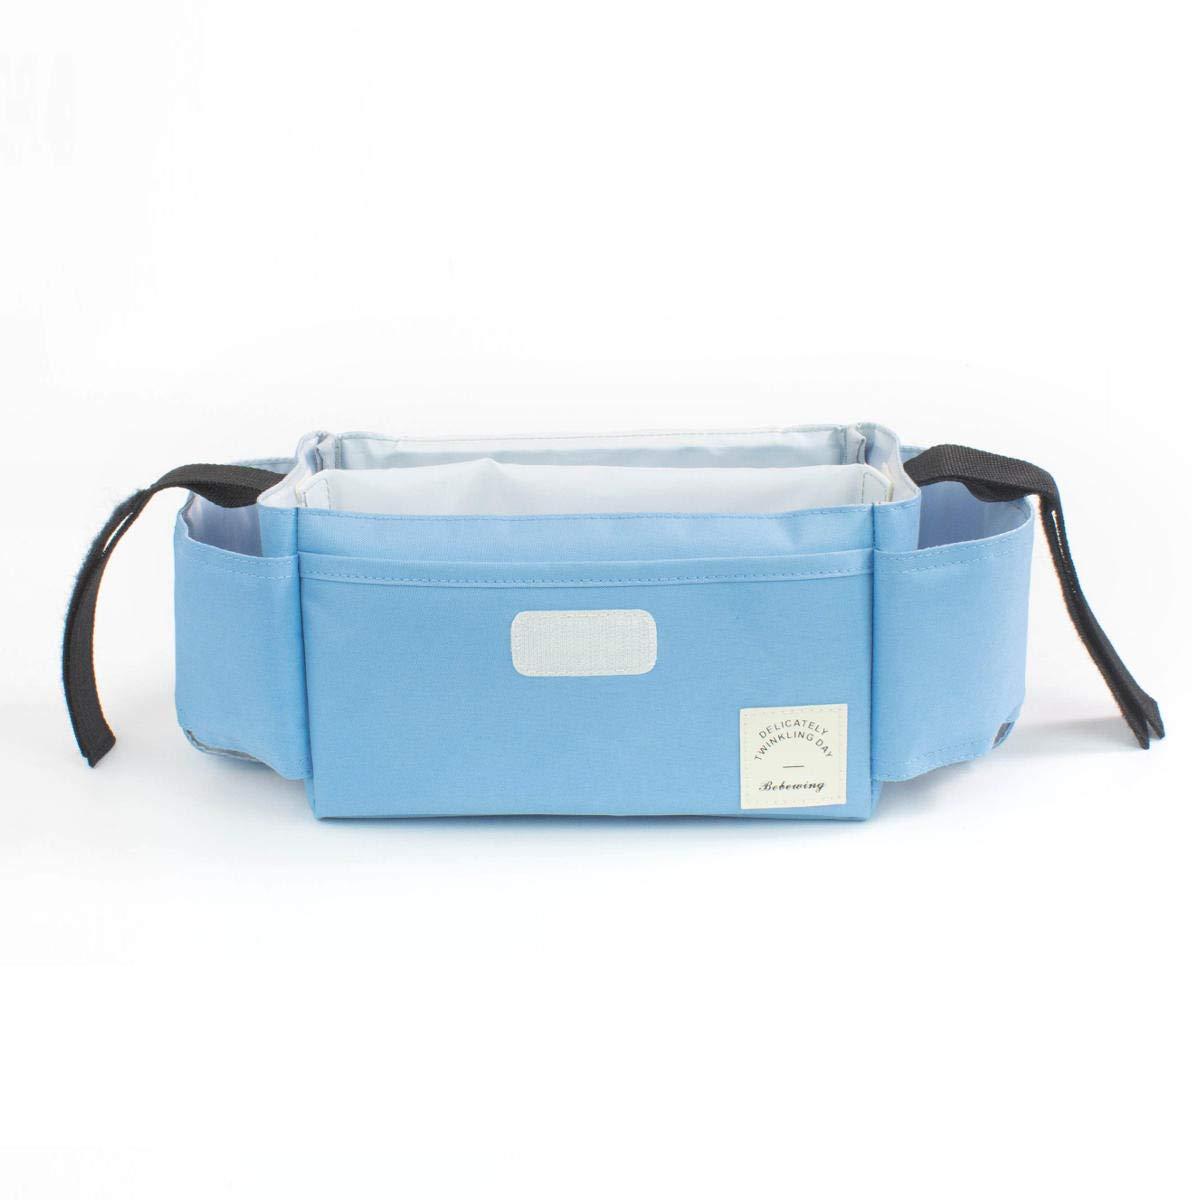 Hitommy Universal Baby Strollers Organizer Pram Diaper Toy Handing Storage Handy Buggy Hook Bag - Blue